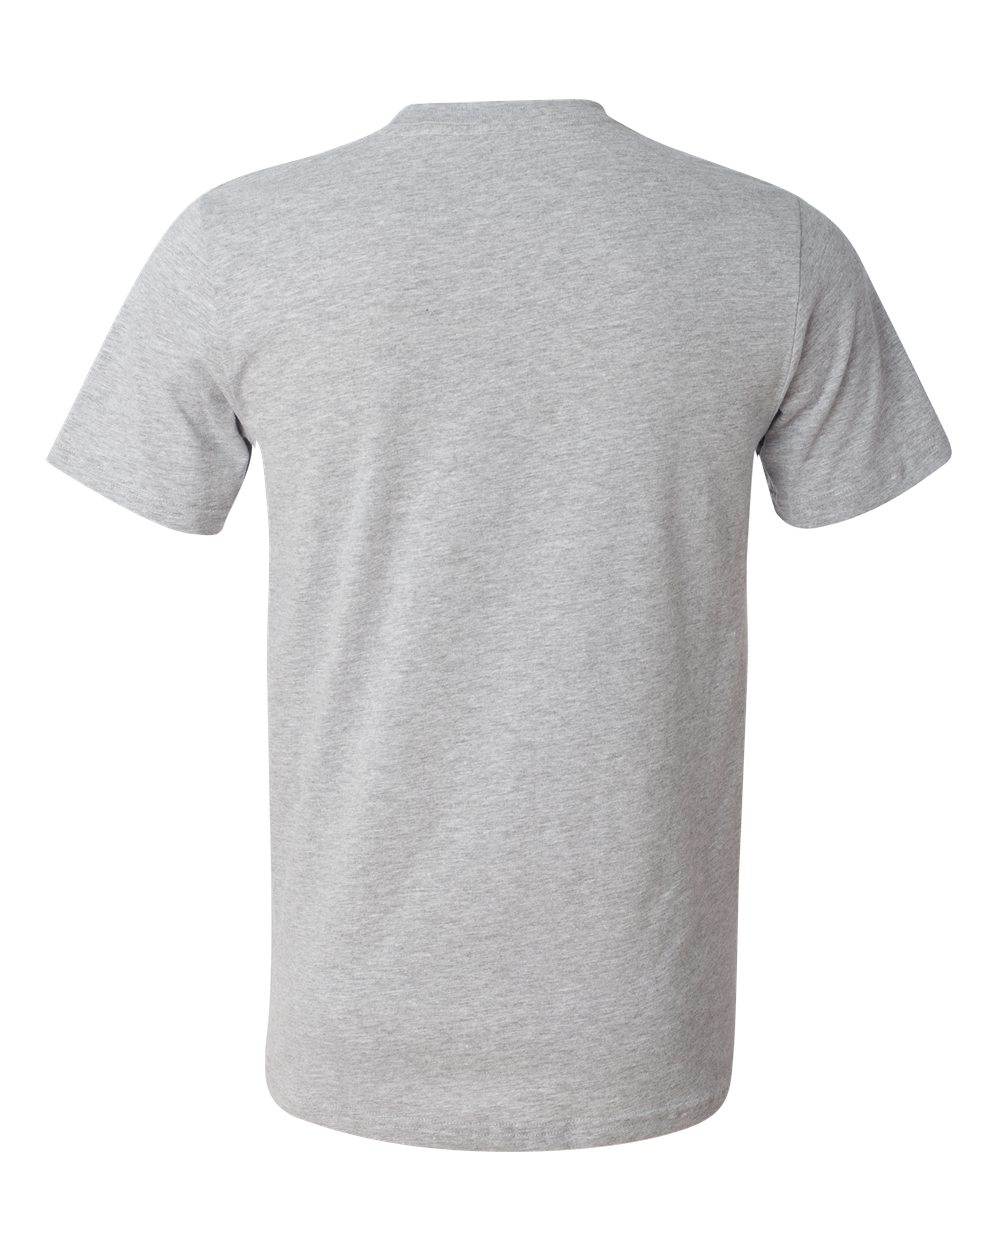 Bella-Canvas-Unisex-Made-in-USA-Jersey-Short-Sleeve-T-Shirt-3001U-XS-3XL thumbnail 19